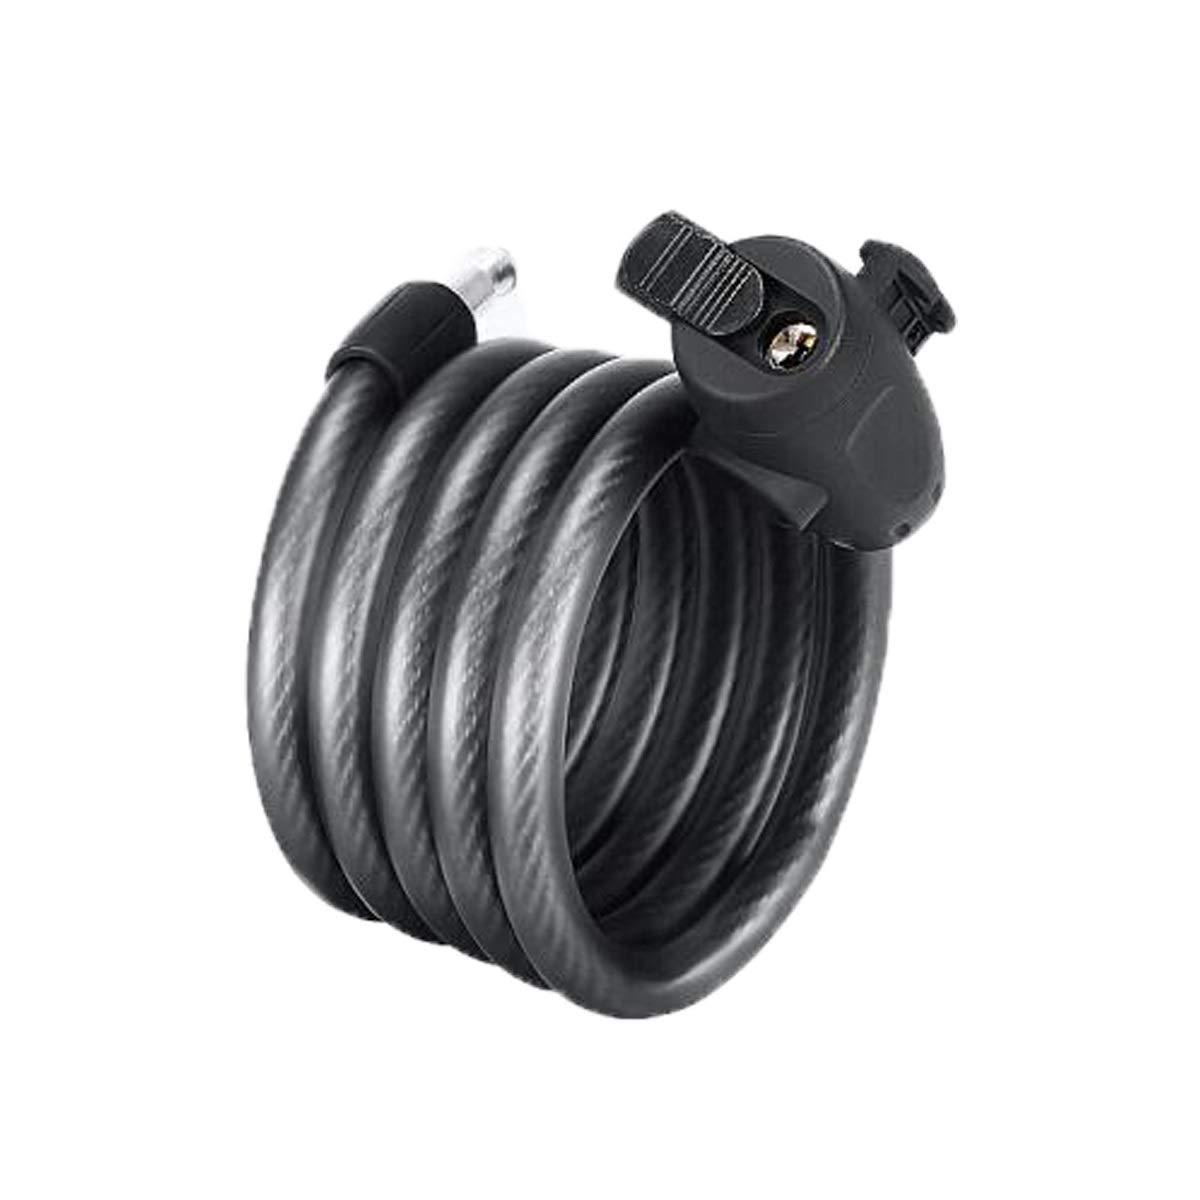 HUIJUNWENTI Bicycle Lock, Portable Ring Key Lock, Car Lock, Motorcycle Lock 1.1 M, Black Safe and Reliable, (Color : Black, Size : 1.5 m)